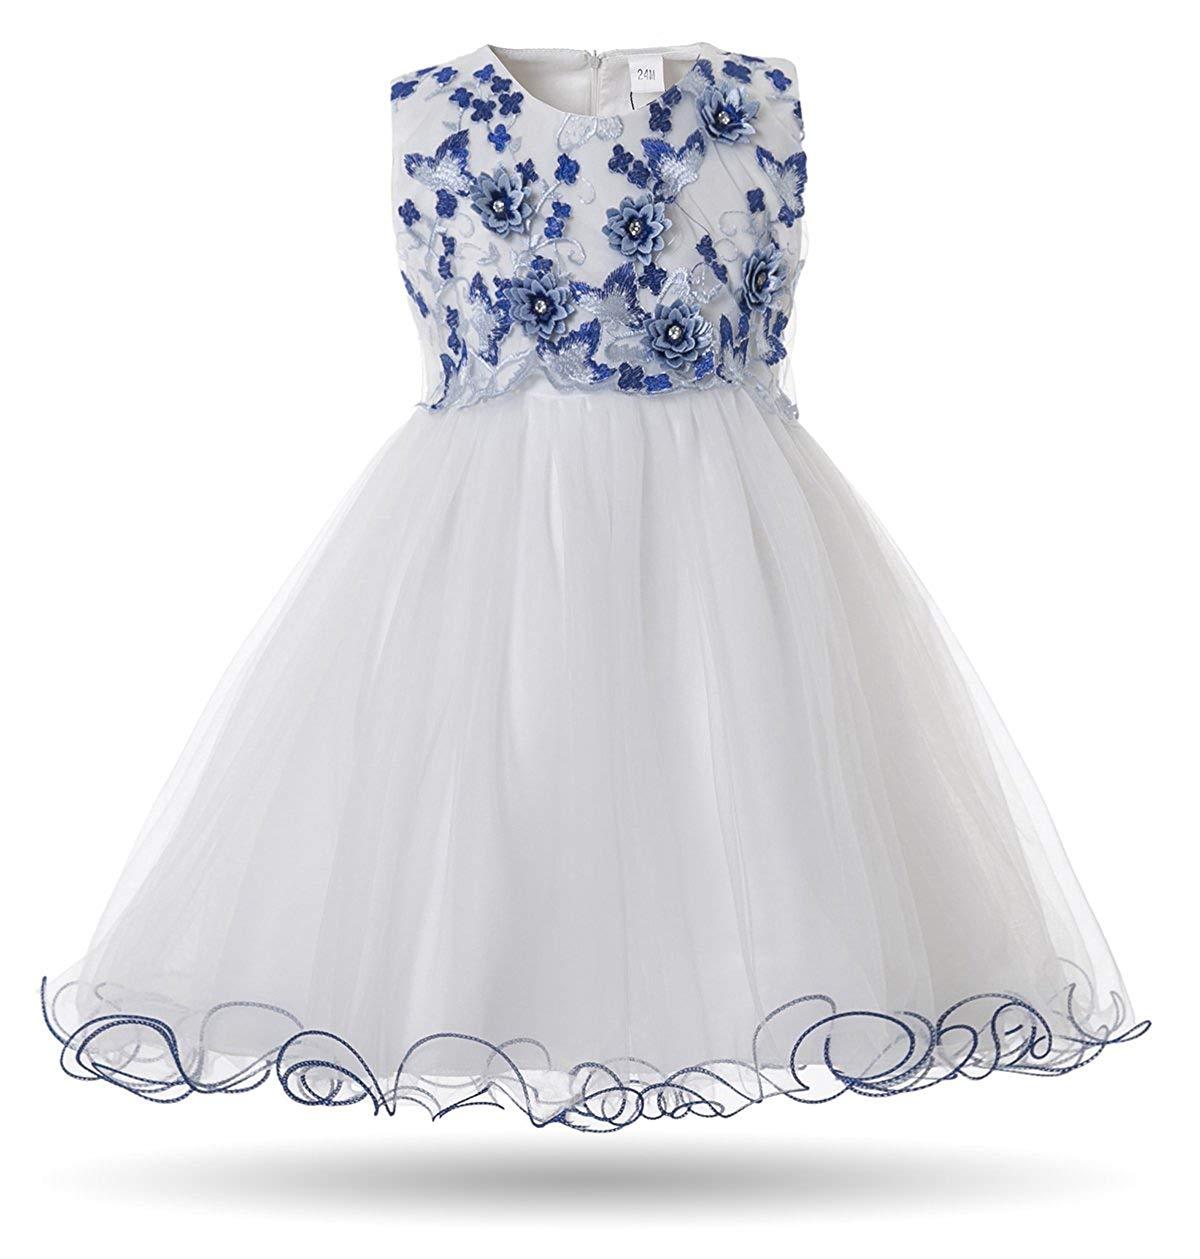 192a4c7c0 Get Quotations · CIELARKO Baby Girls Dress 3D Flower Infant Christening  Party Dresses for 0-24 Months